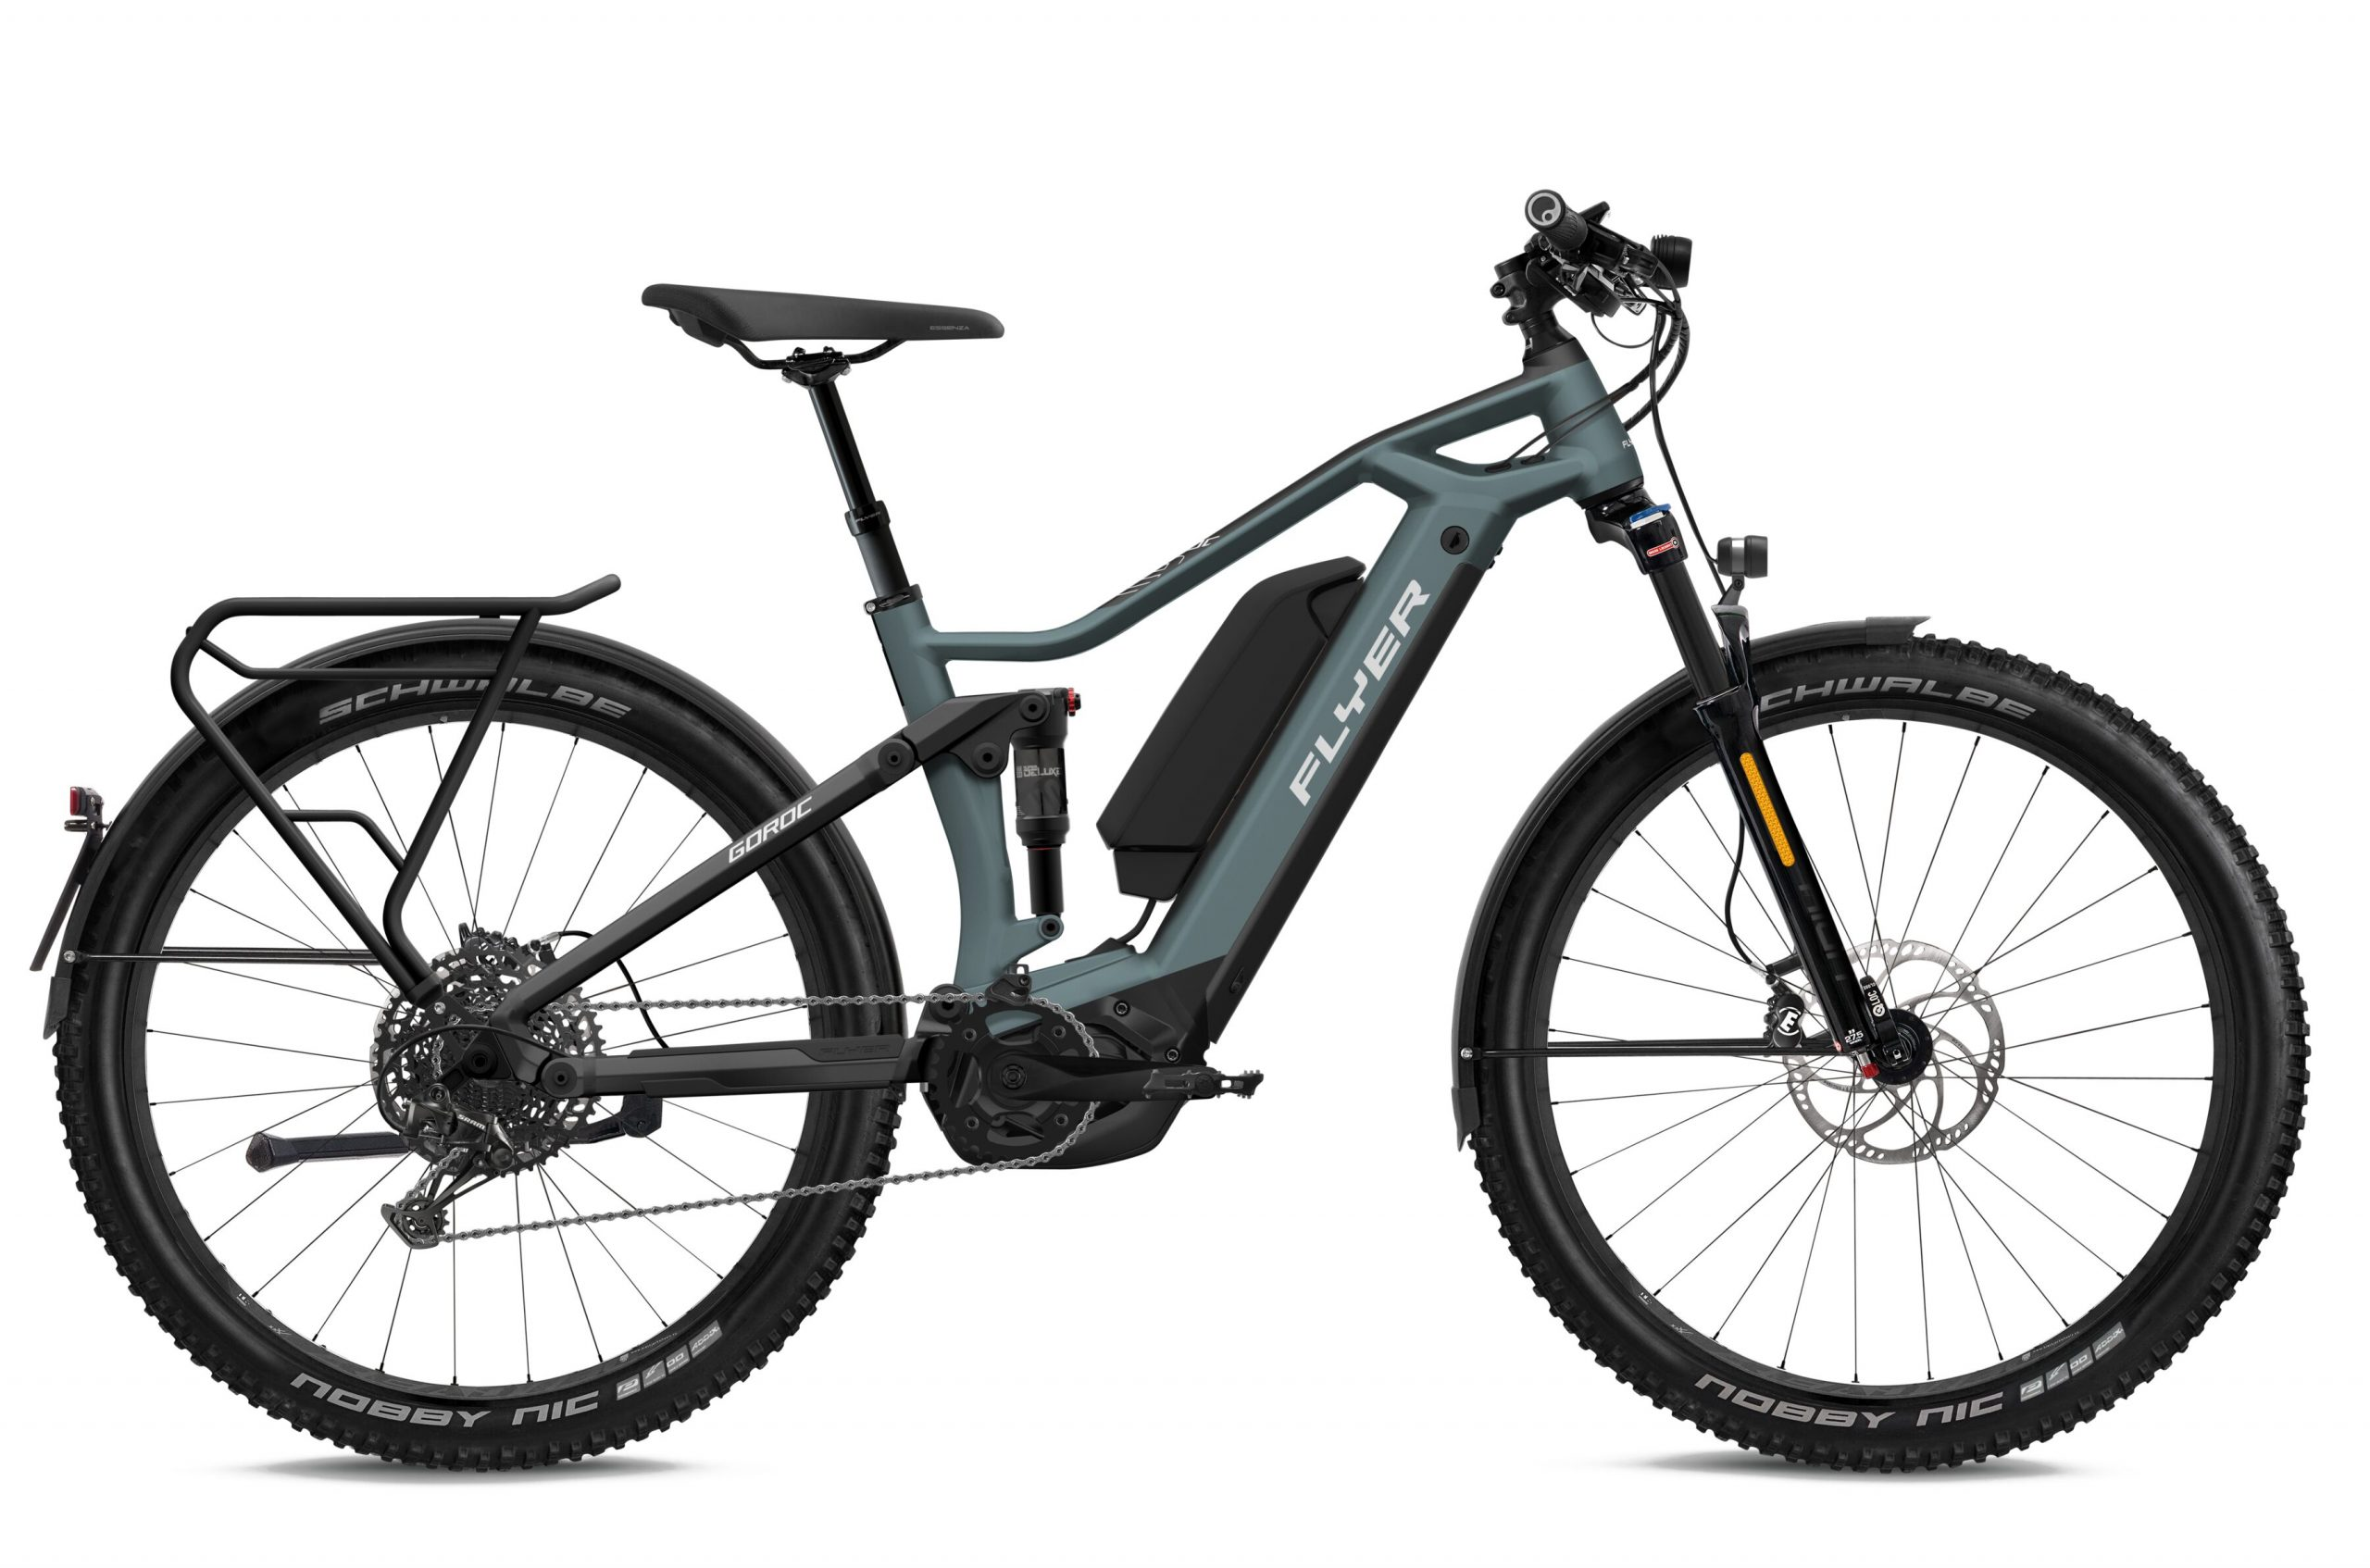 Online-FLYER_E-Bikes_MY21_Goroc3_650_Fullsuspension_HS_EU_PigeonBlueBlackMatt